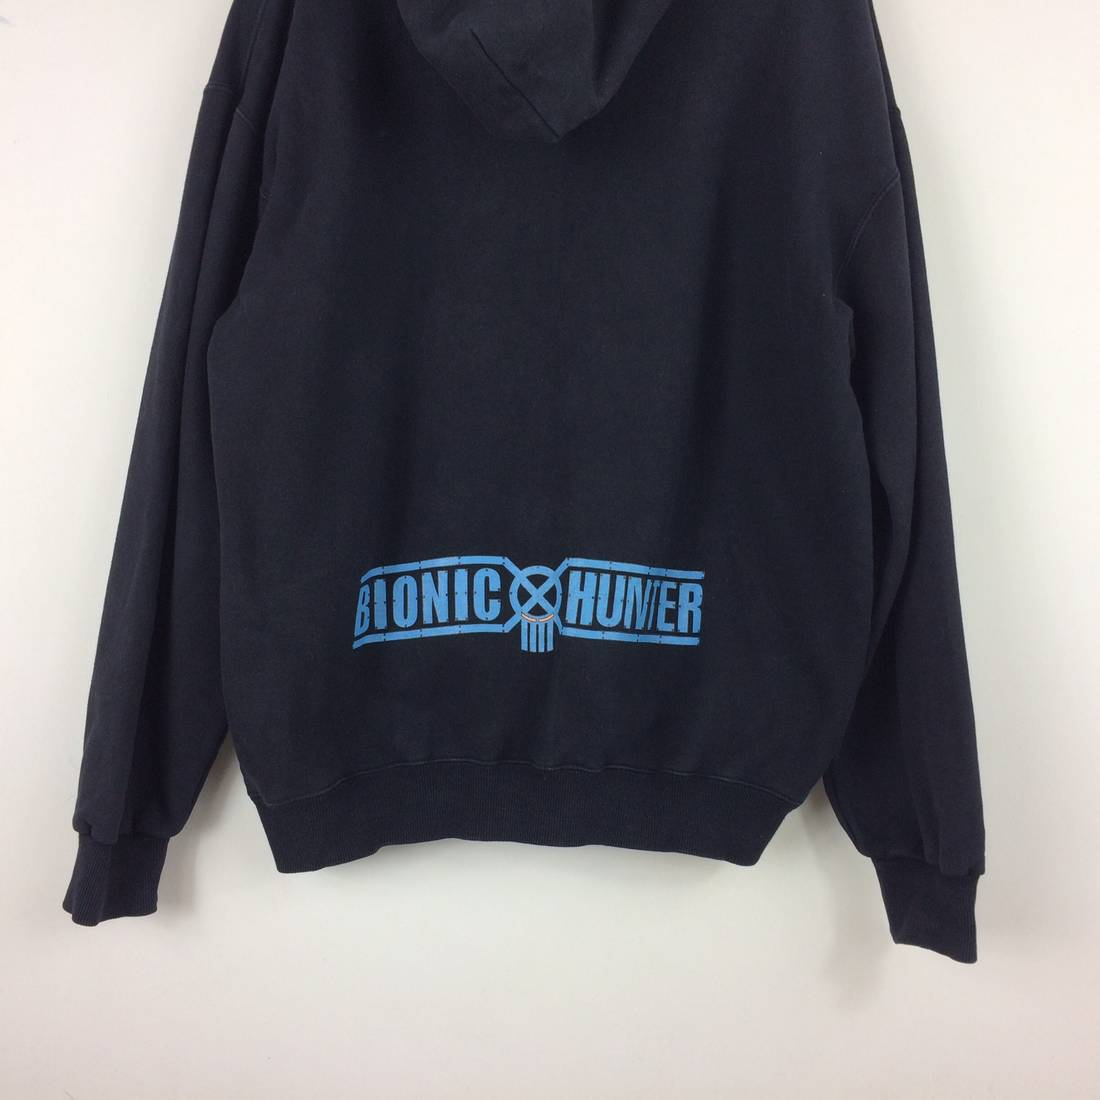 Rare!!! Bounty Hunter Pullover Sweatshirt Qk7N3Bo7eH